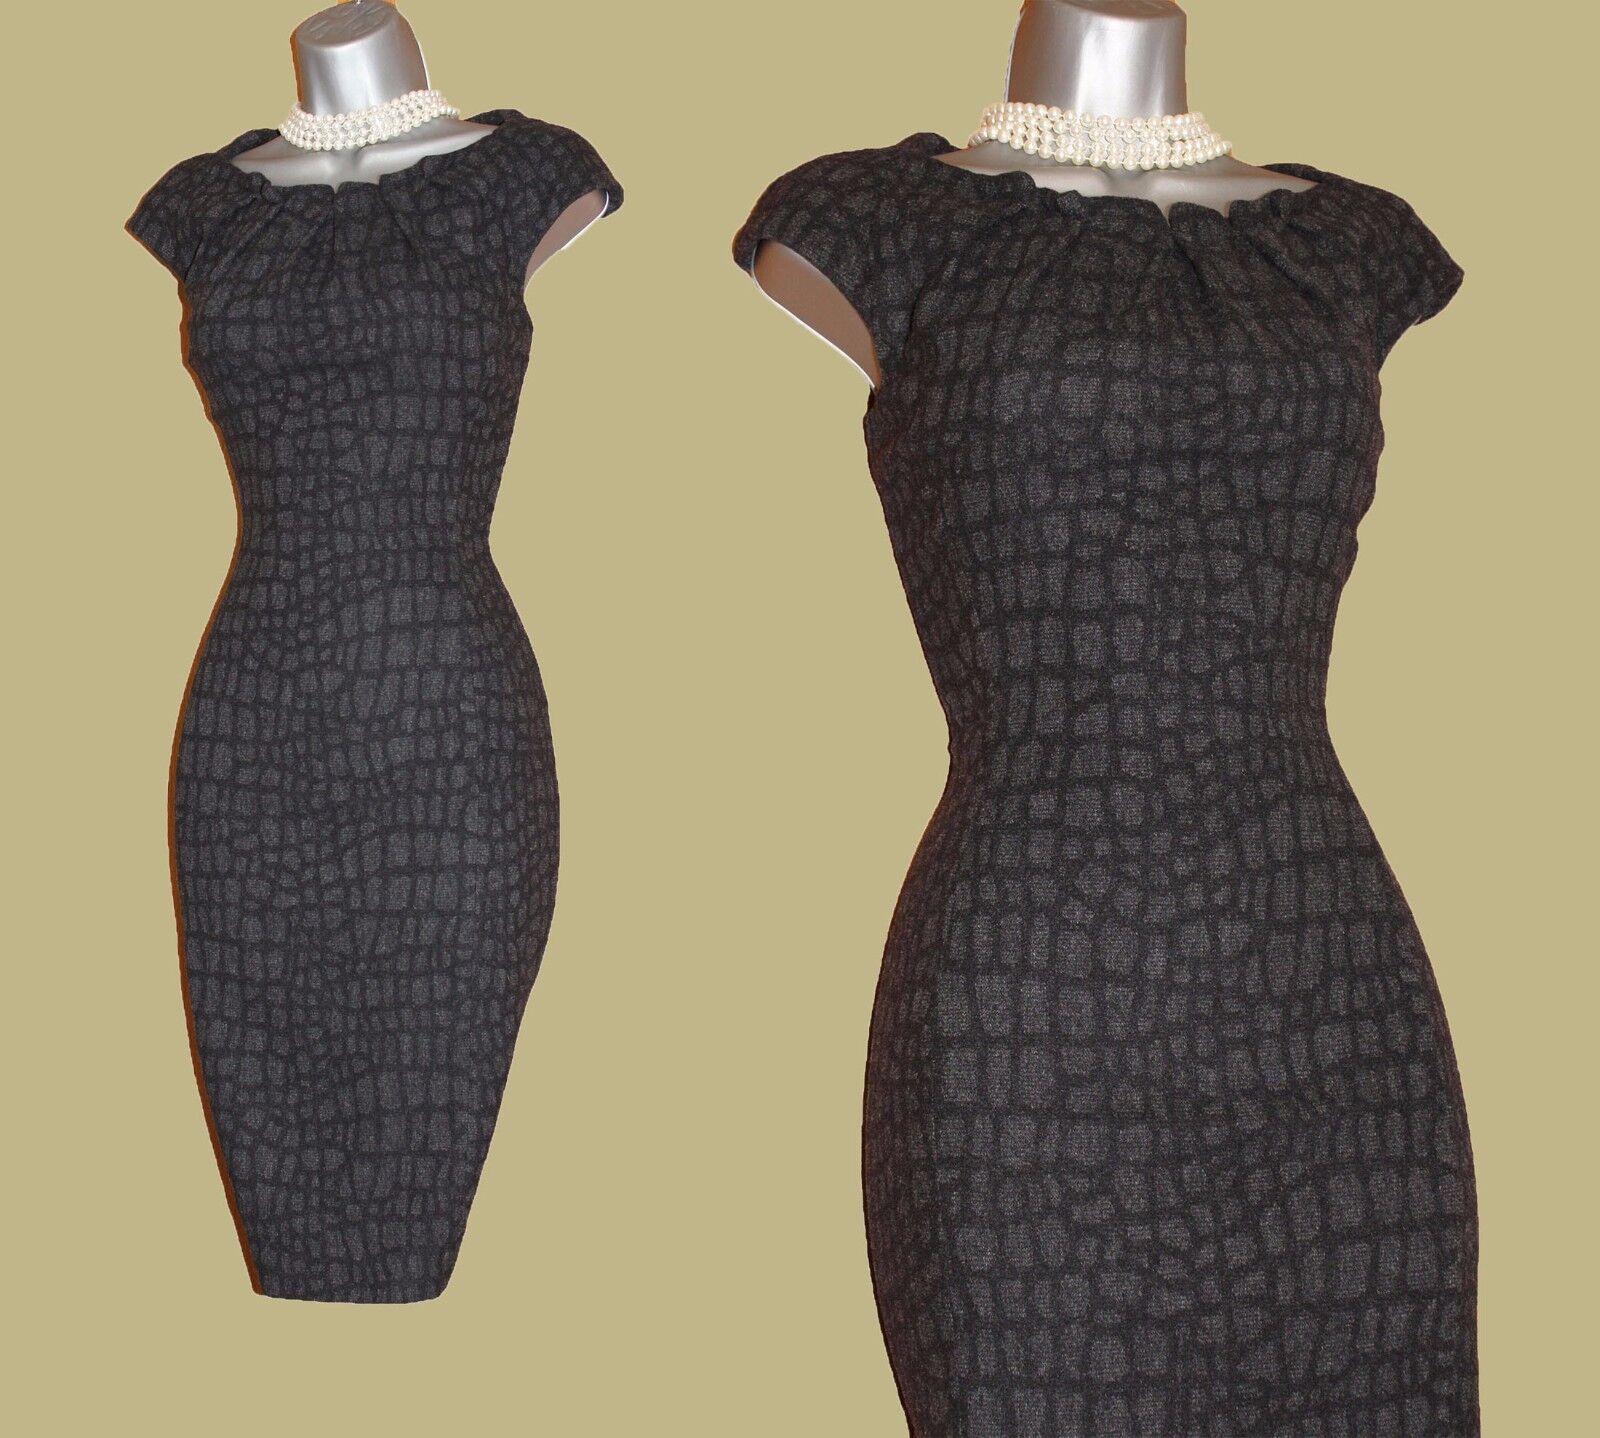 Karen Millen Animal Print Wool Blend Formal Office Pencil Wiggle Dress UK10 EU38